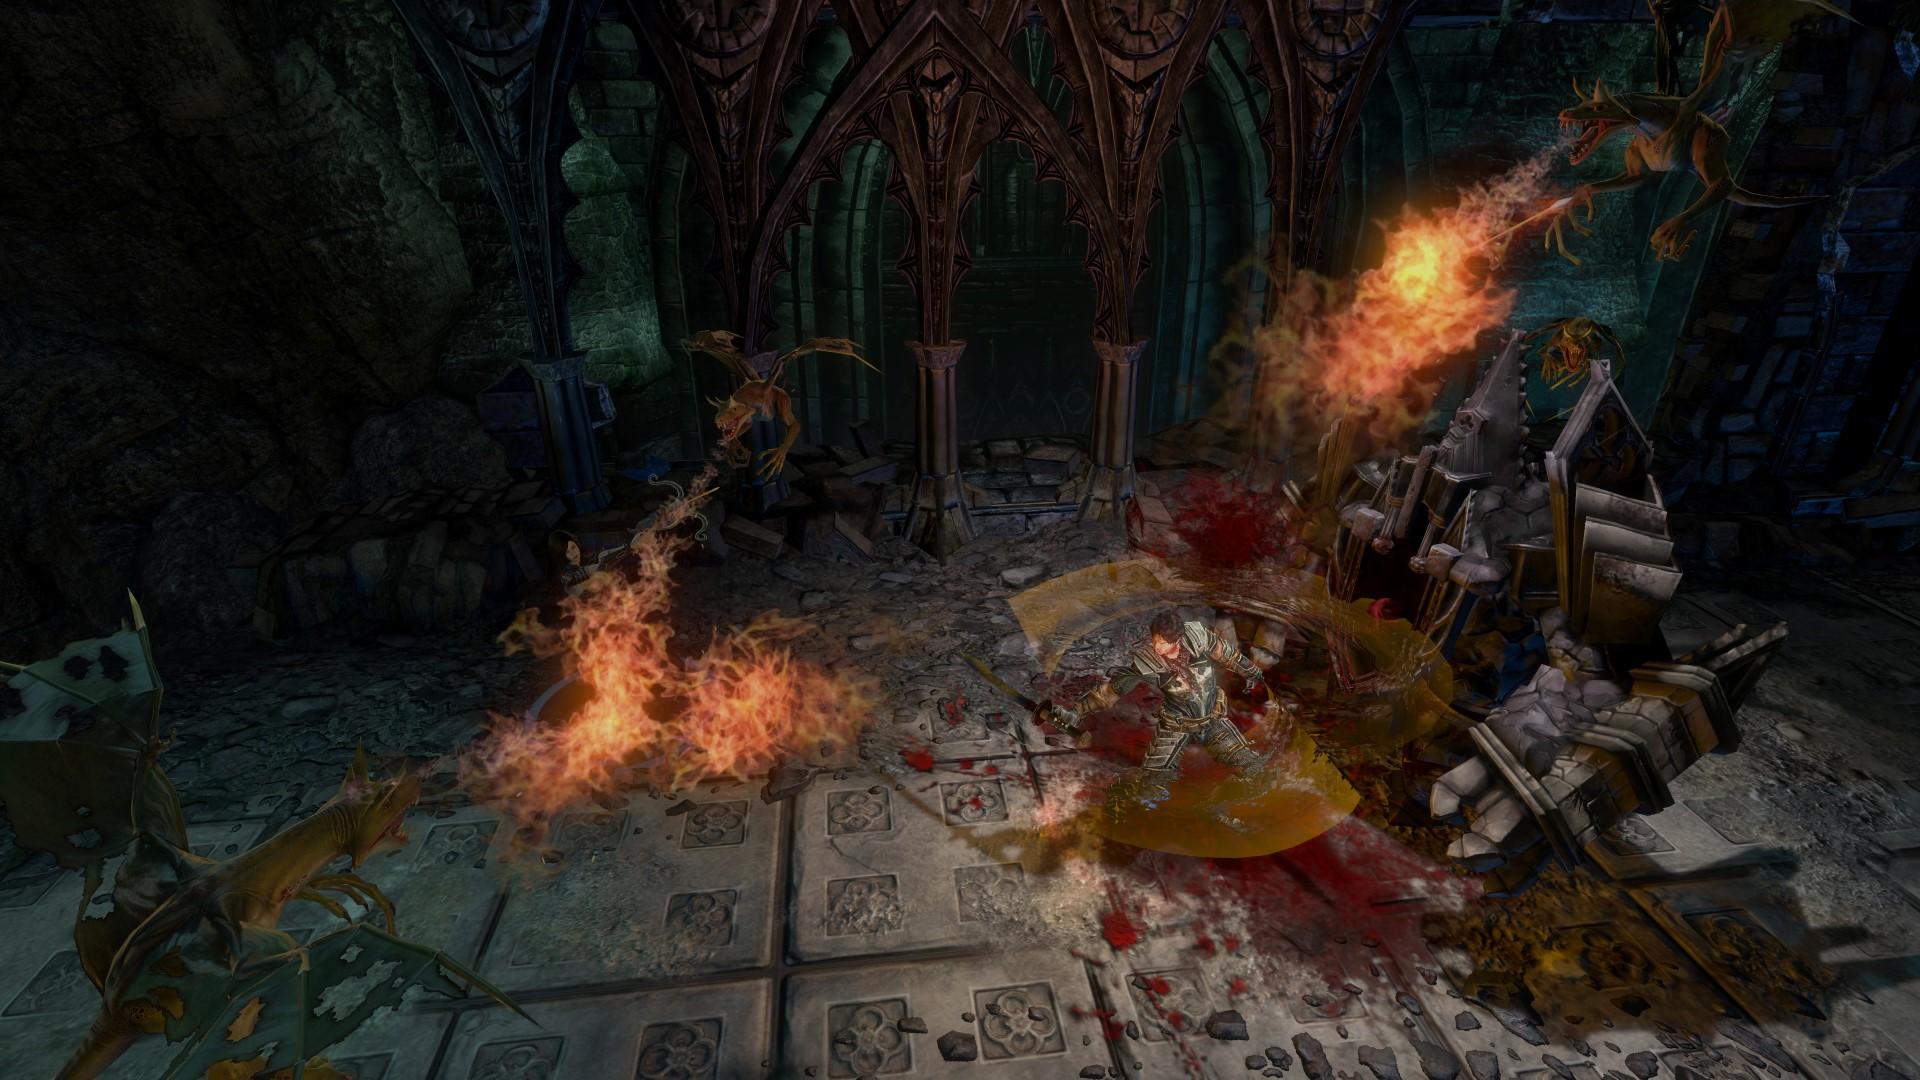 Free download blood games pc